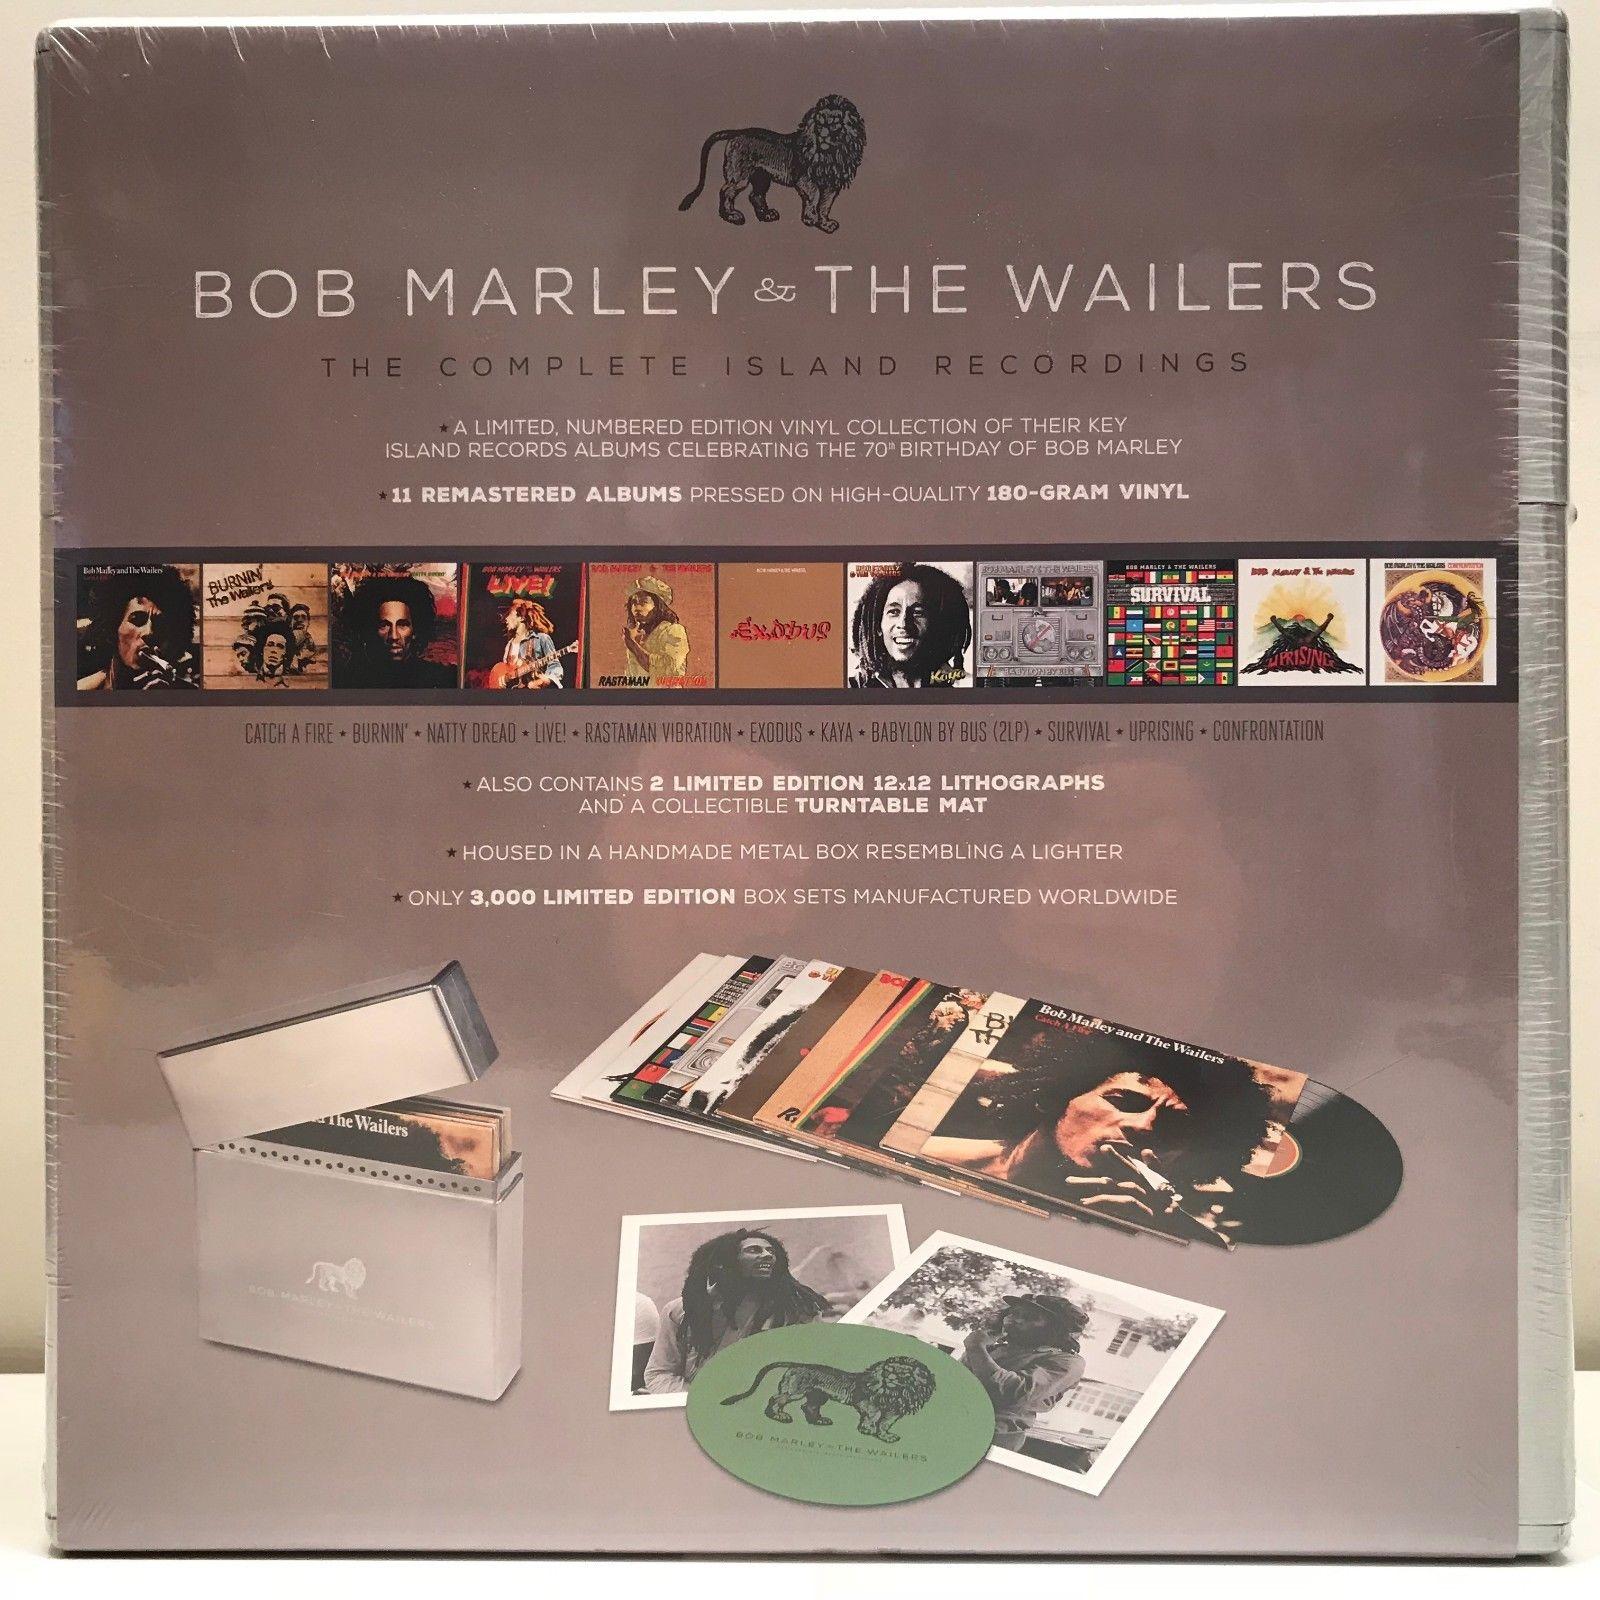 Bob Marley & the Wailers Complete Island Recordings 11 LP #'d metal box set